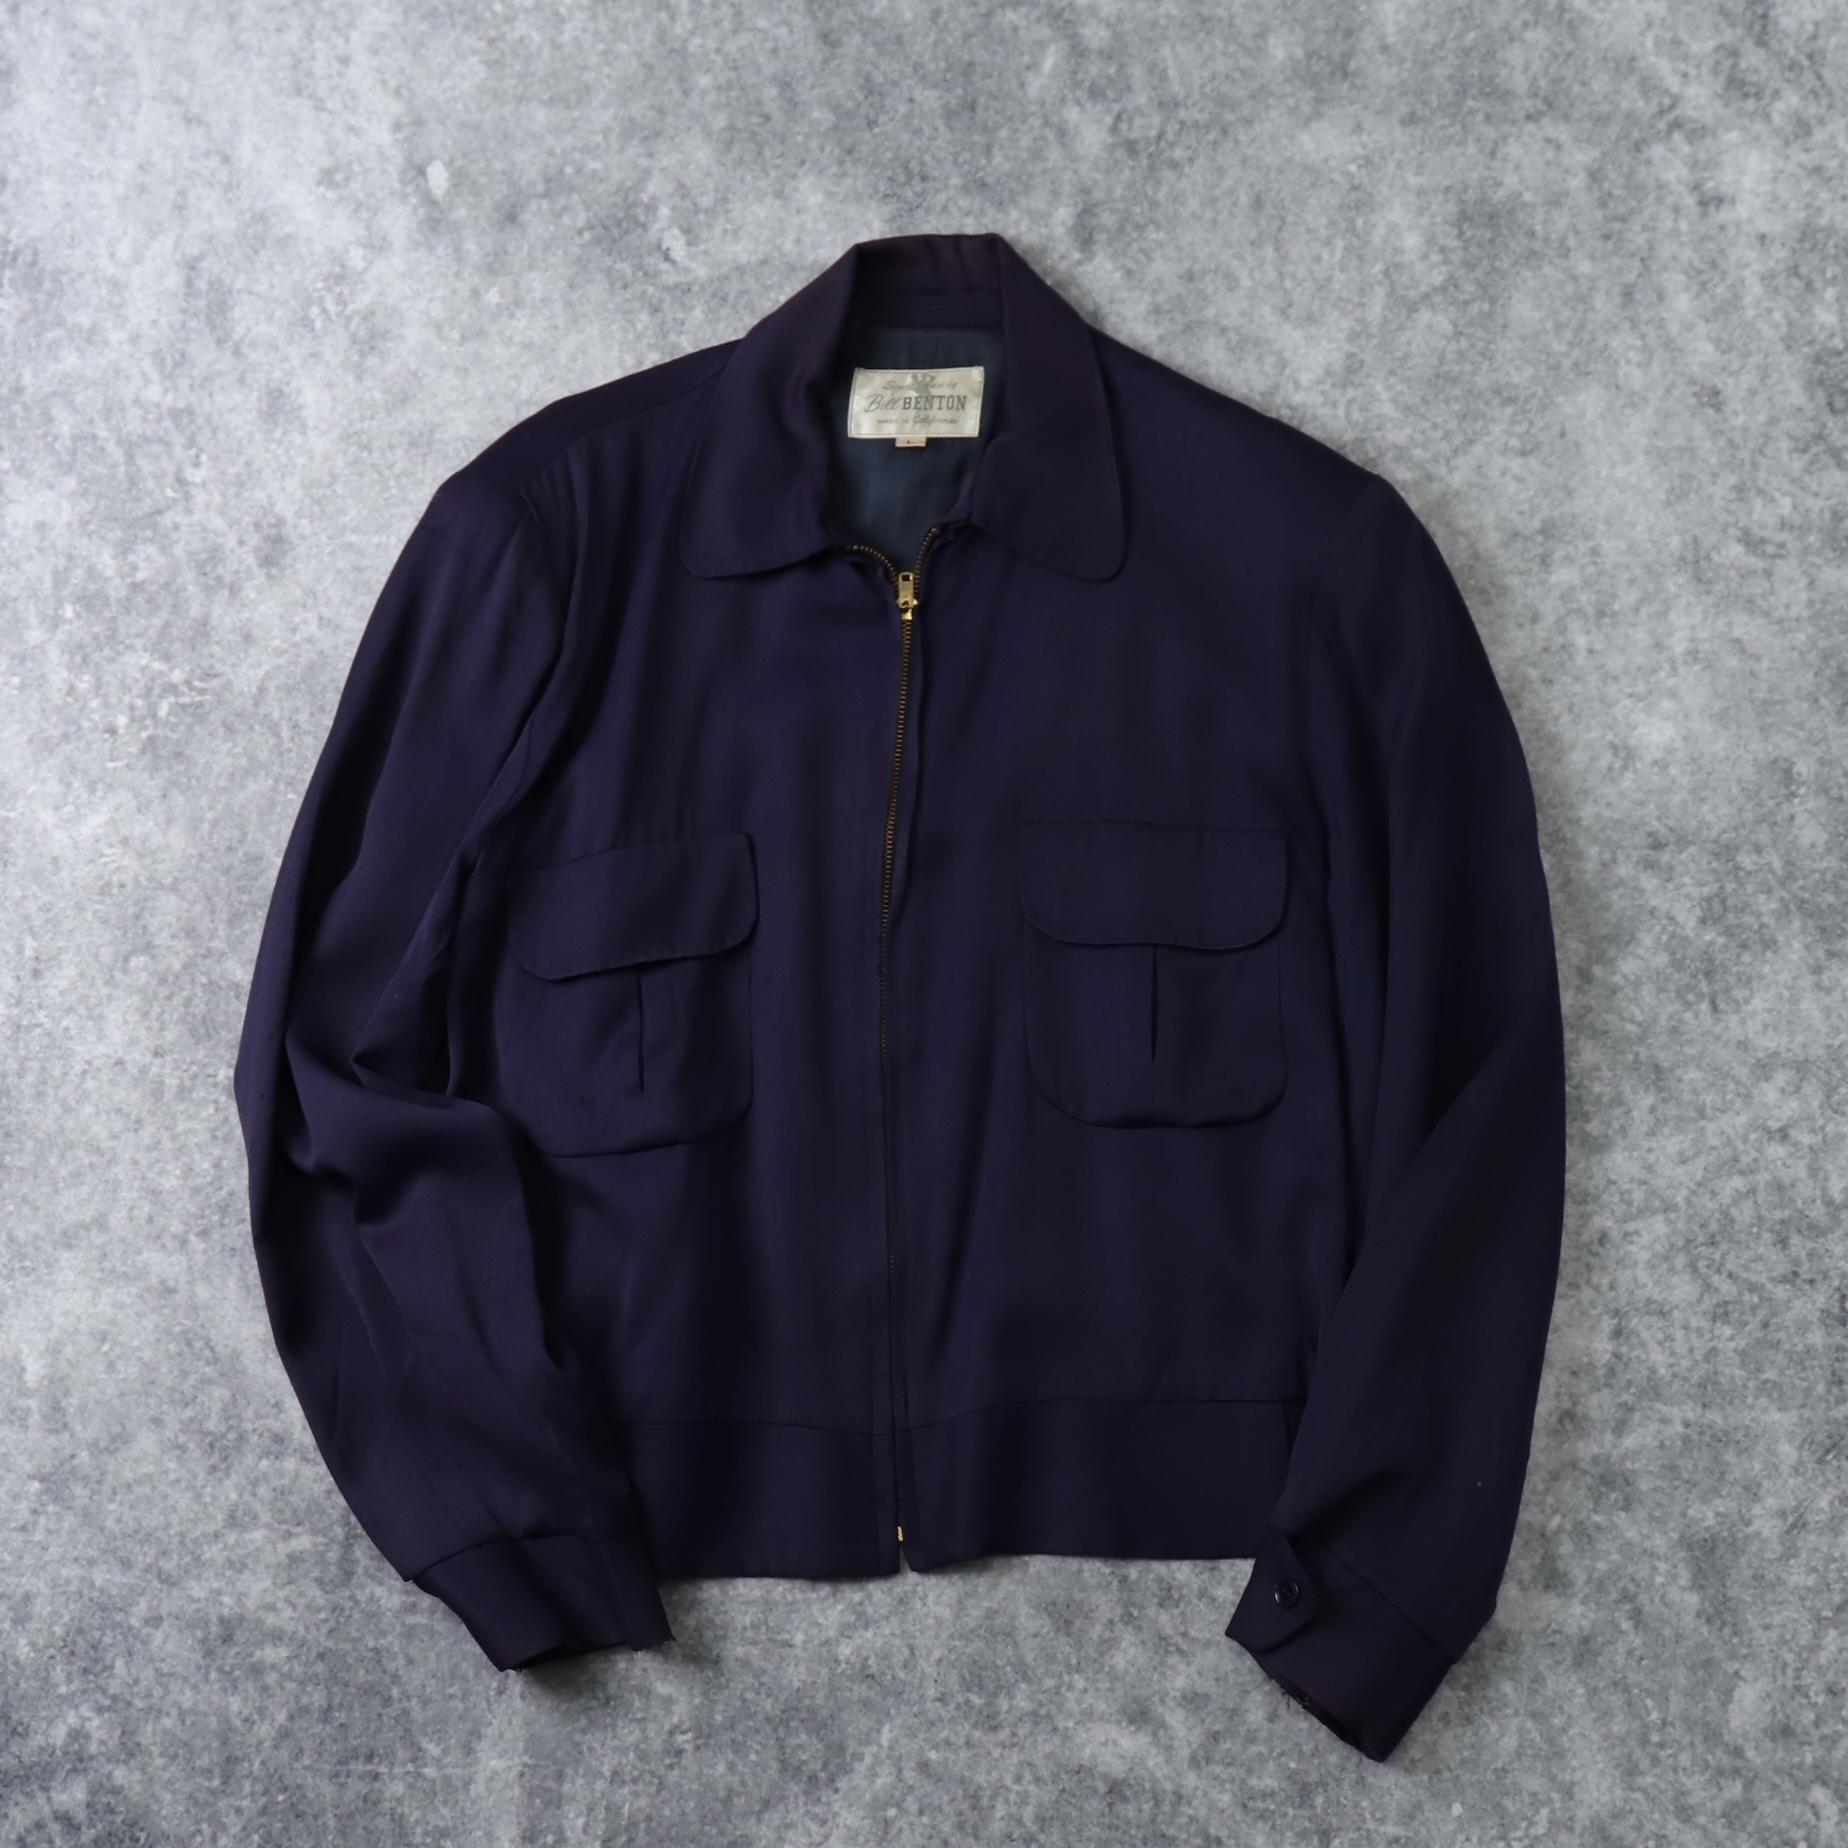 50s ''Bill BENTON'' Gabardine Jacket 50年代 ギャバジャン ギャバジン ロカビリー ギャバジンジャケット A651